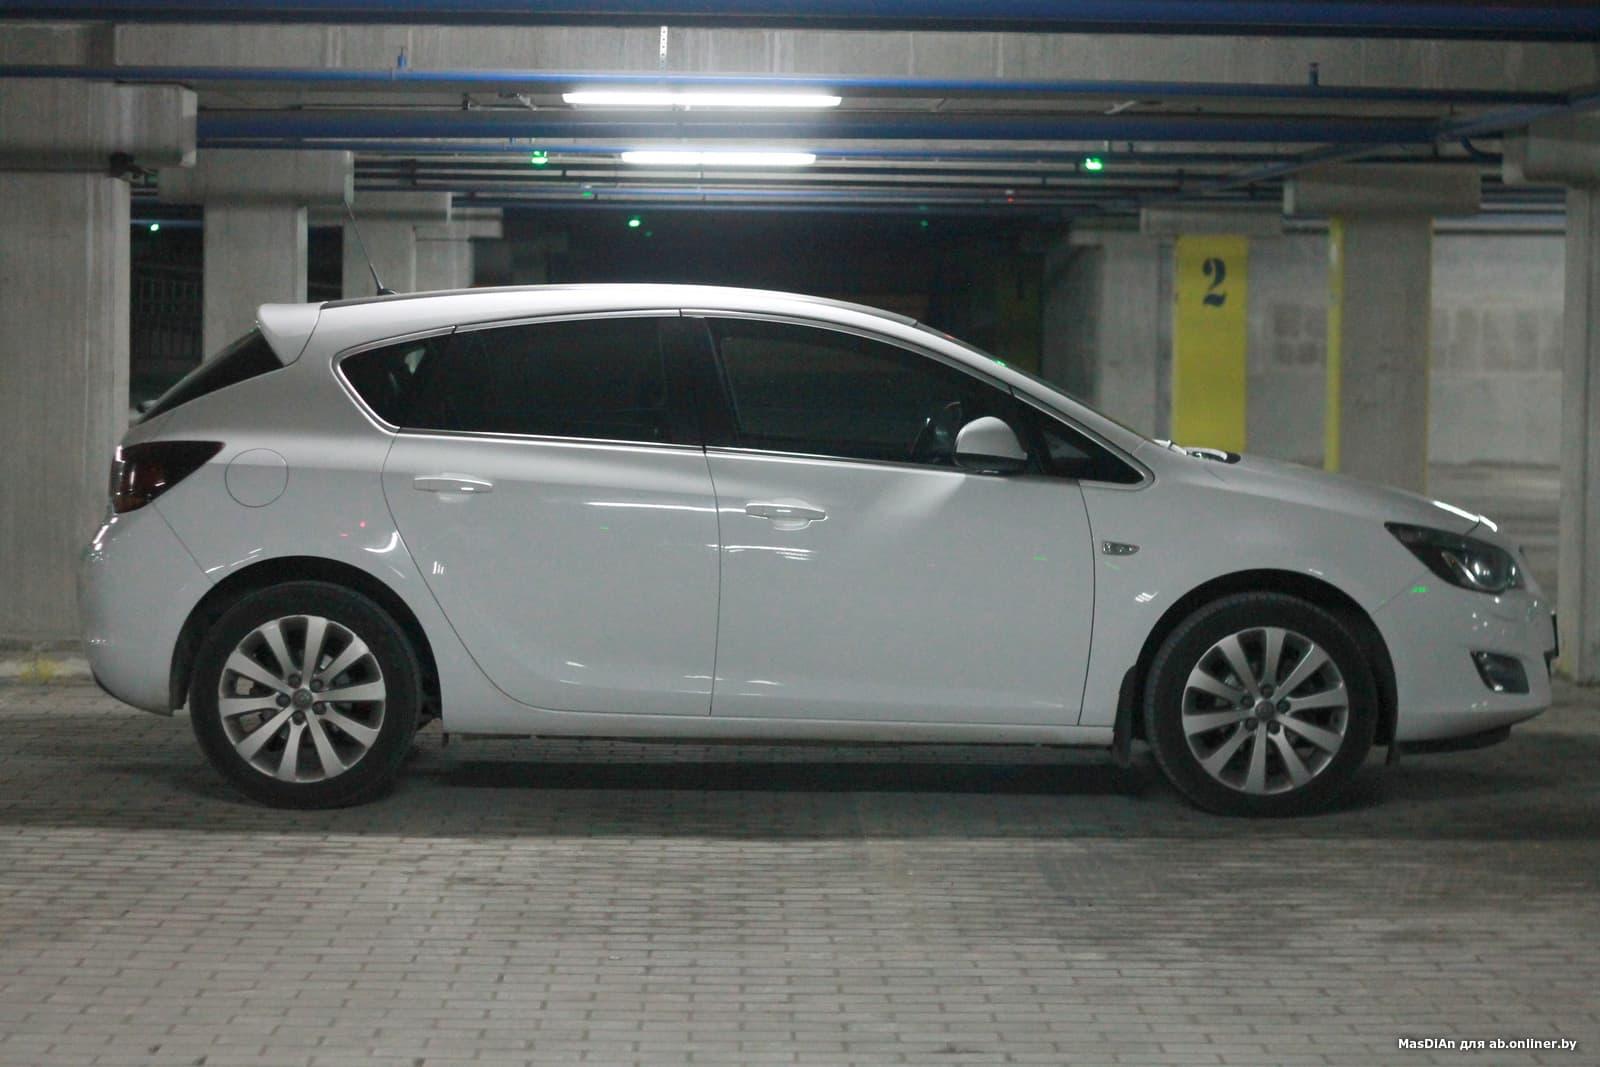 Opel Astra J Cosmo Turbo